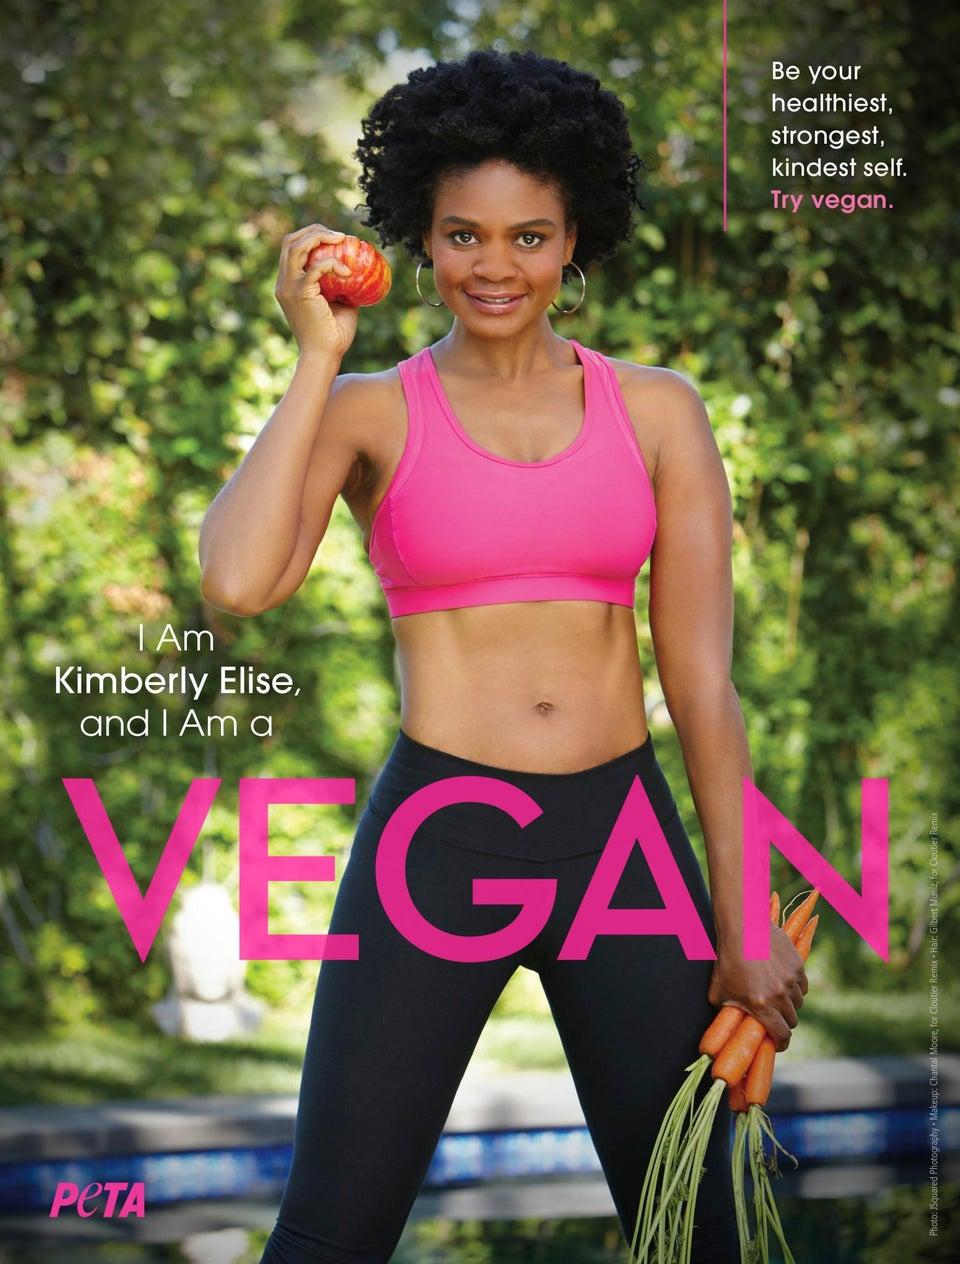 Kimberly Elise Celebrates Her Vegan Lifestyle in New PETA Ad